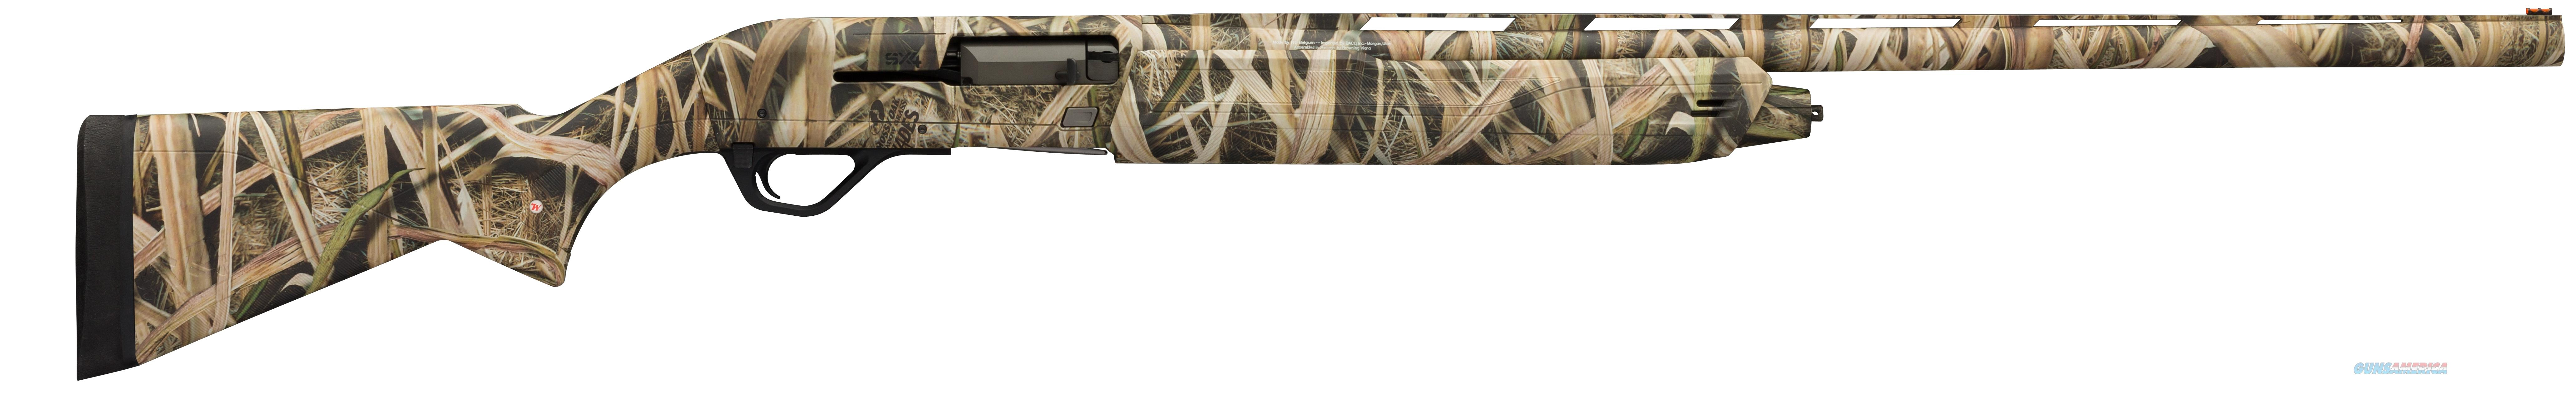 SX4 Wtfl Hntr Compact MOSGB 20Ga 26-3In  511231691  Guns > Shotguns > Winchester Shotguns - Modern > Autoloaders > Hunting